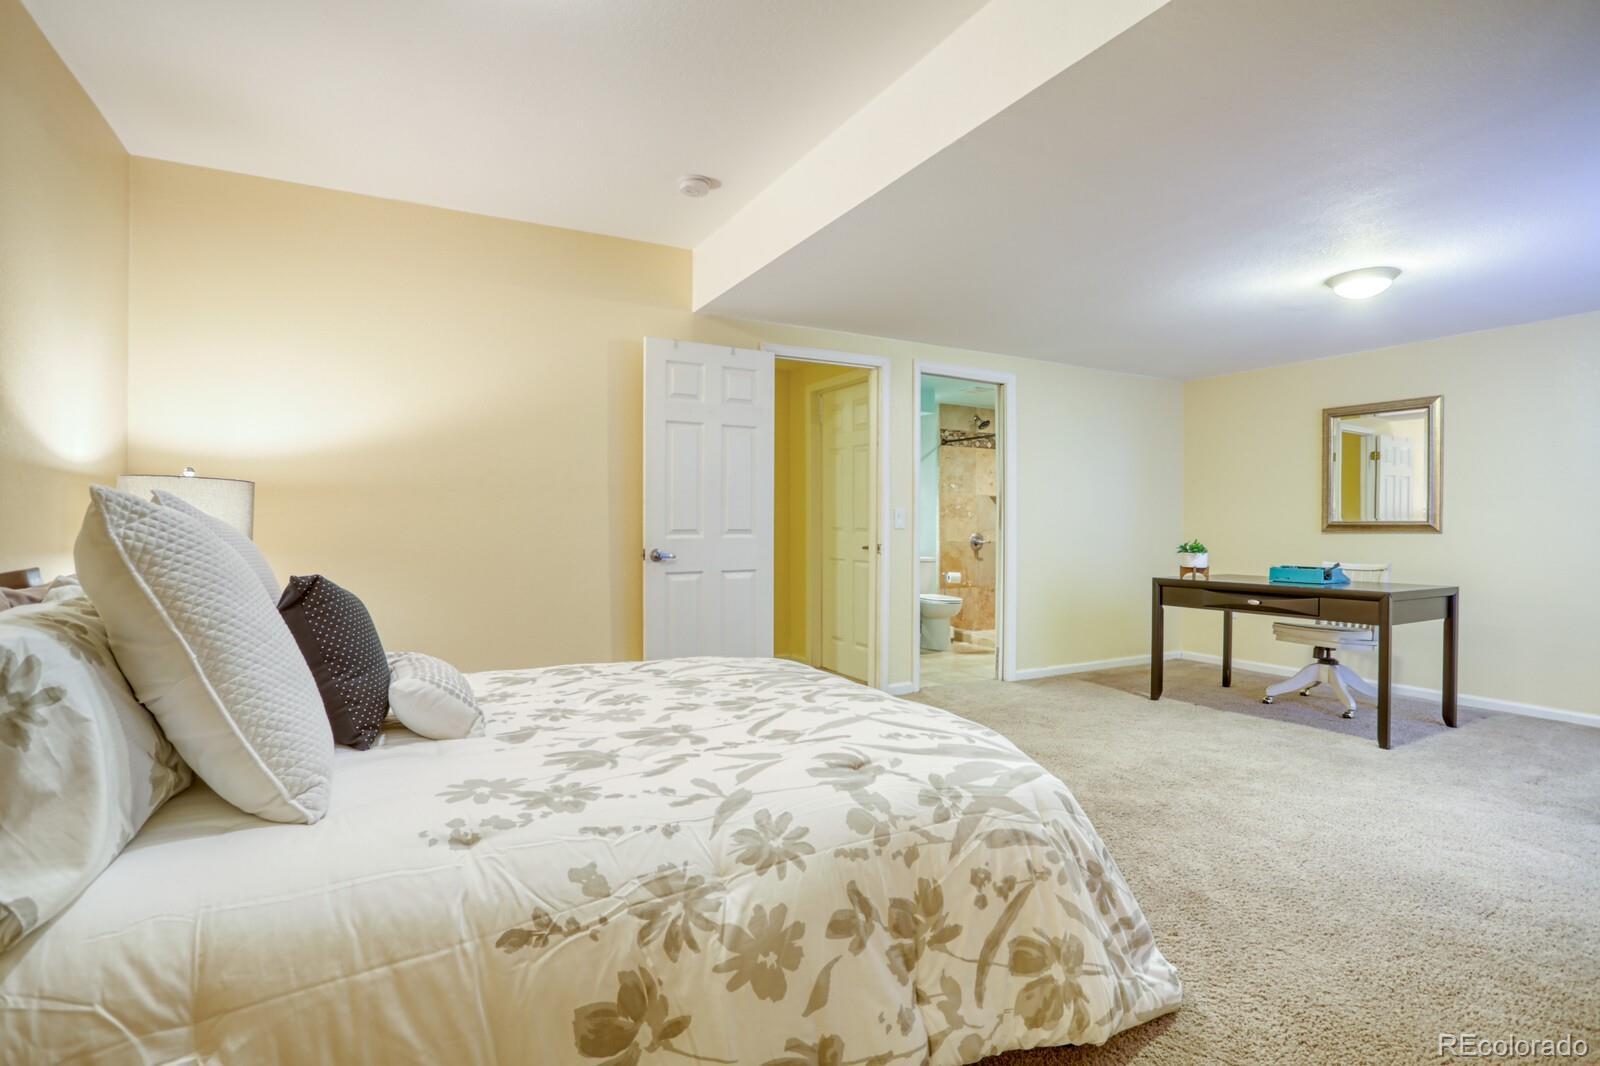 MLS# 8551789 - 31 - 22752 E Briarwood Place, Aurora, CO 80016